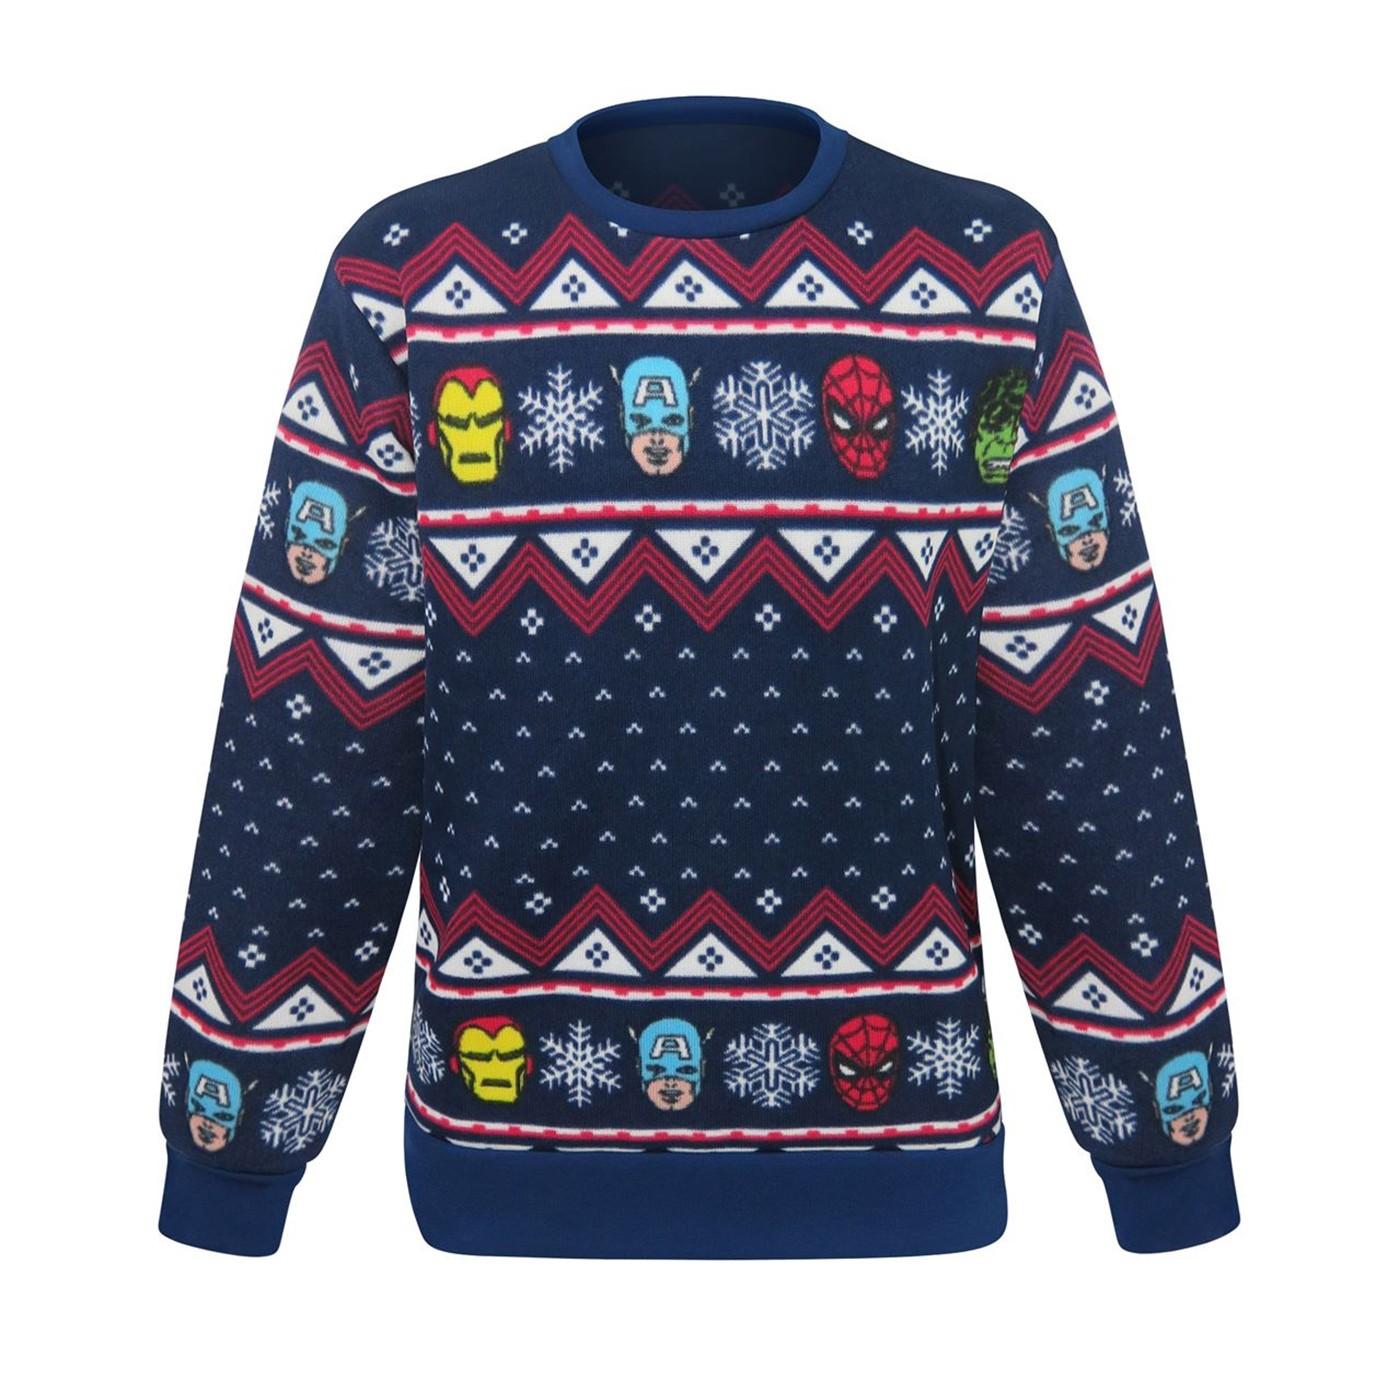 Mens 3x Ugly Christmas Sweater.Marvel Avengers Ugly Men S Christmas Sweater